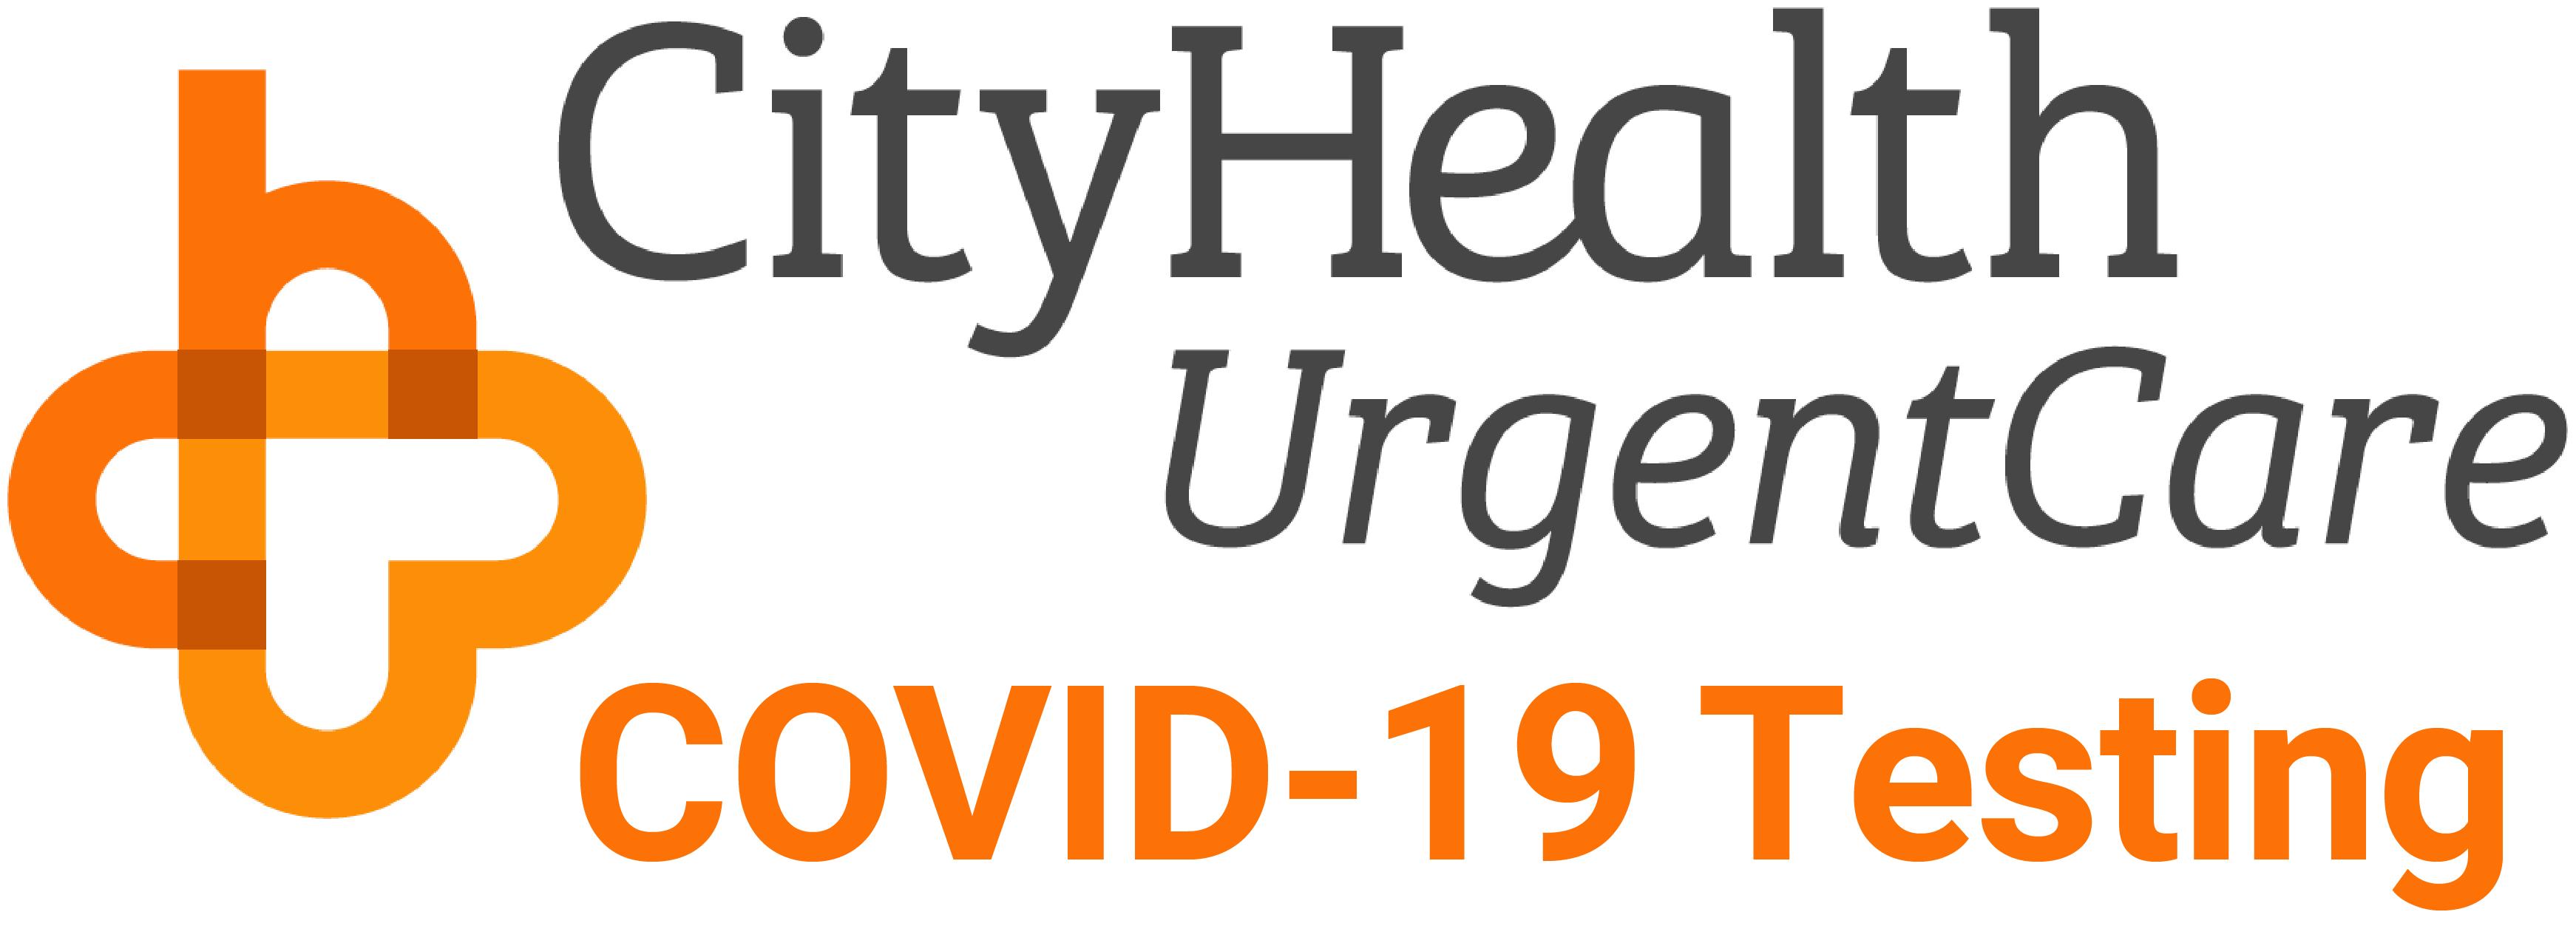 CityHealth Urgent Care - Rapid Testing Site Logo